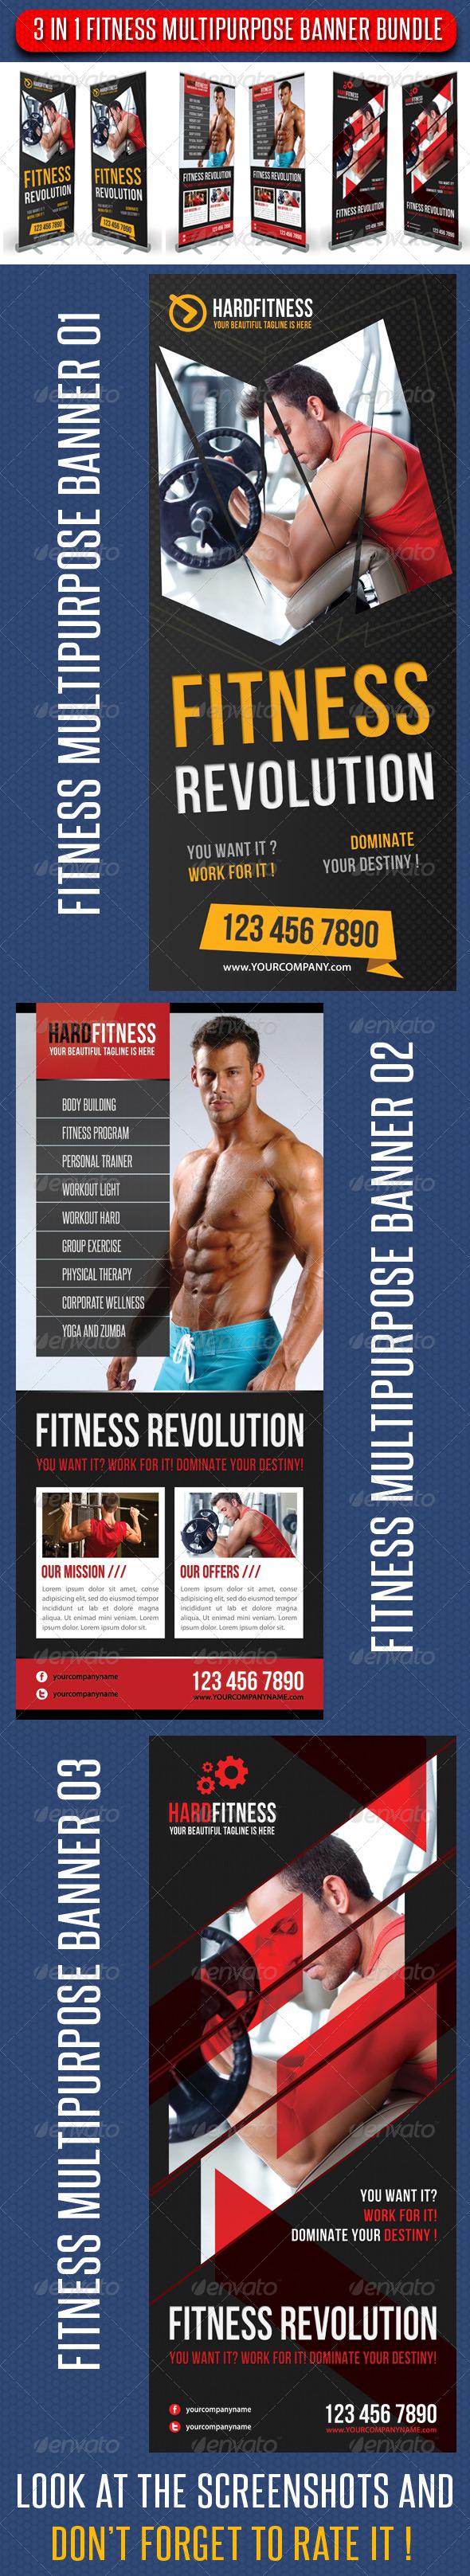 3 in 1 Fitness Multipurpose Banner Bundle 01 - Signage Print Templates